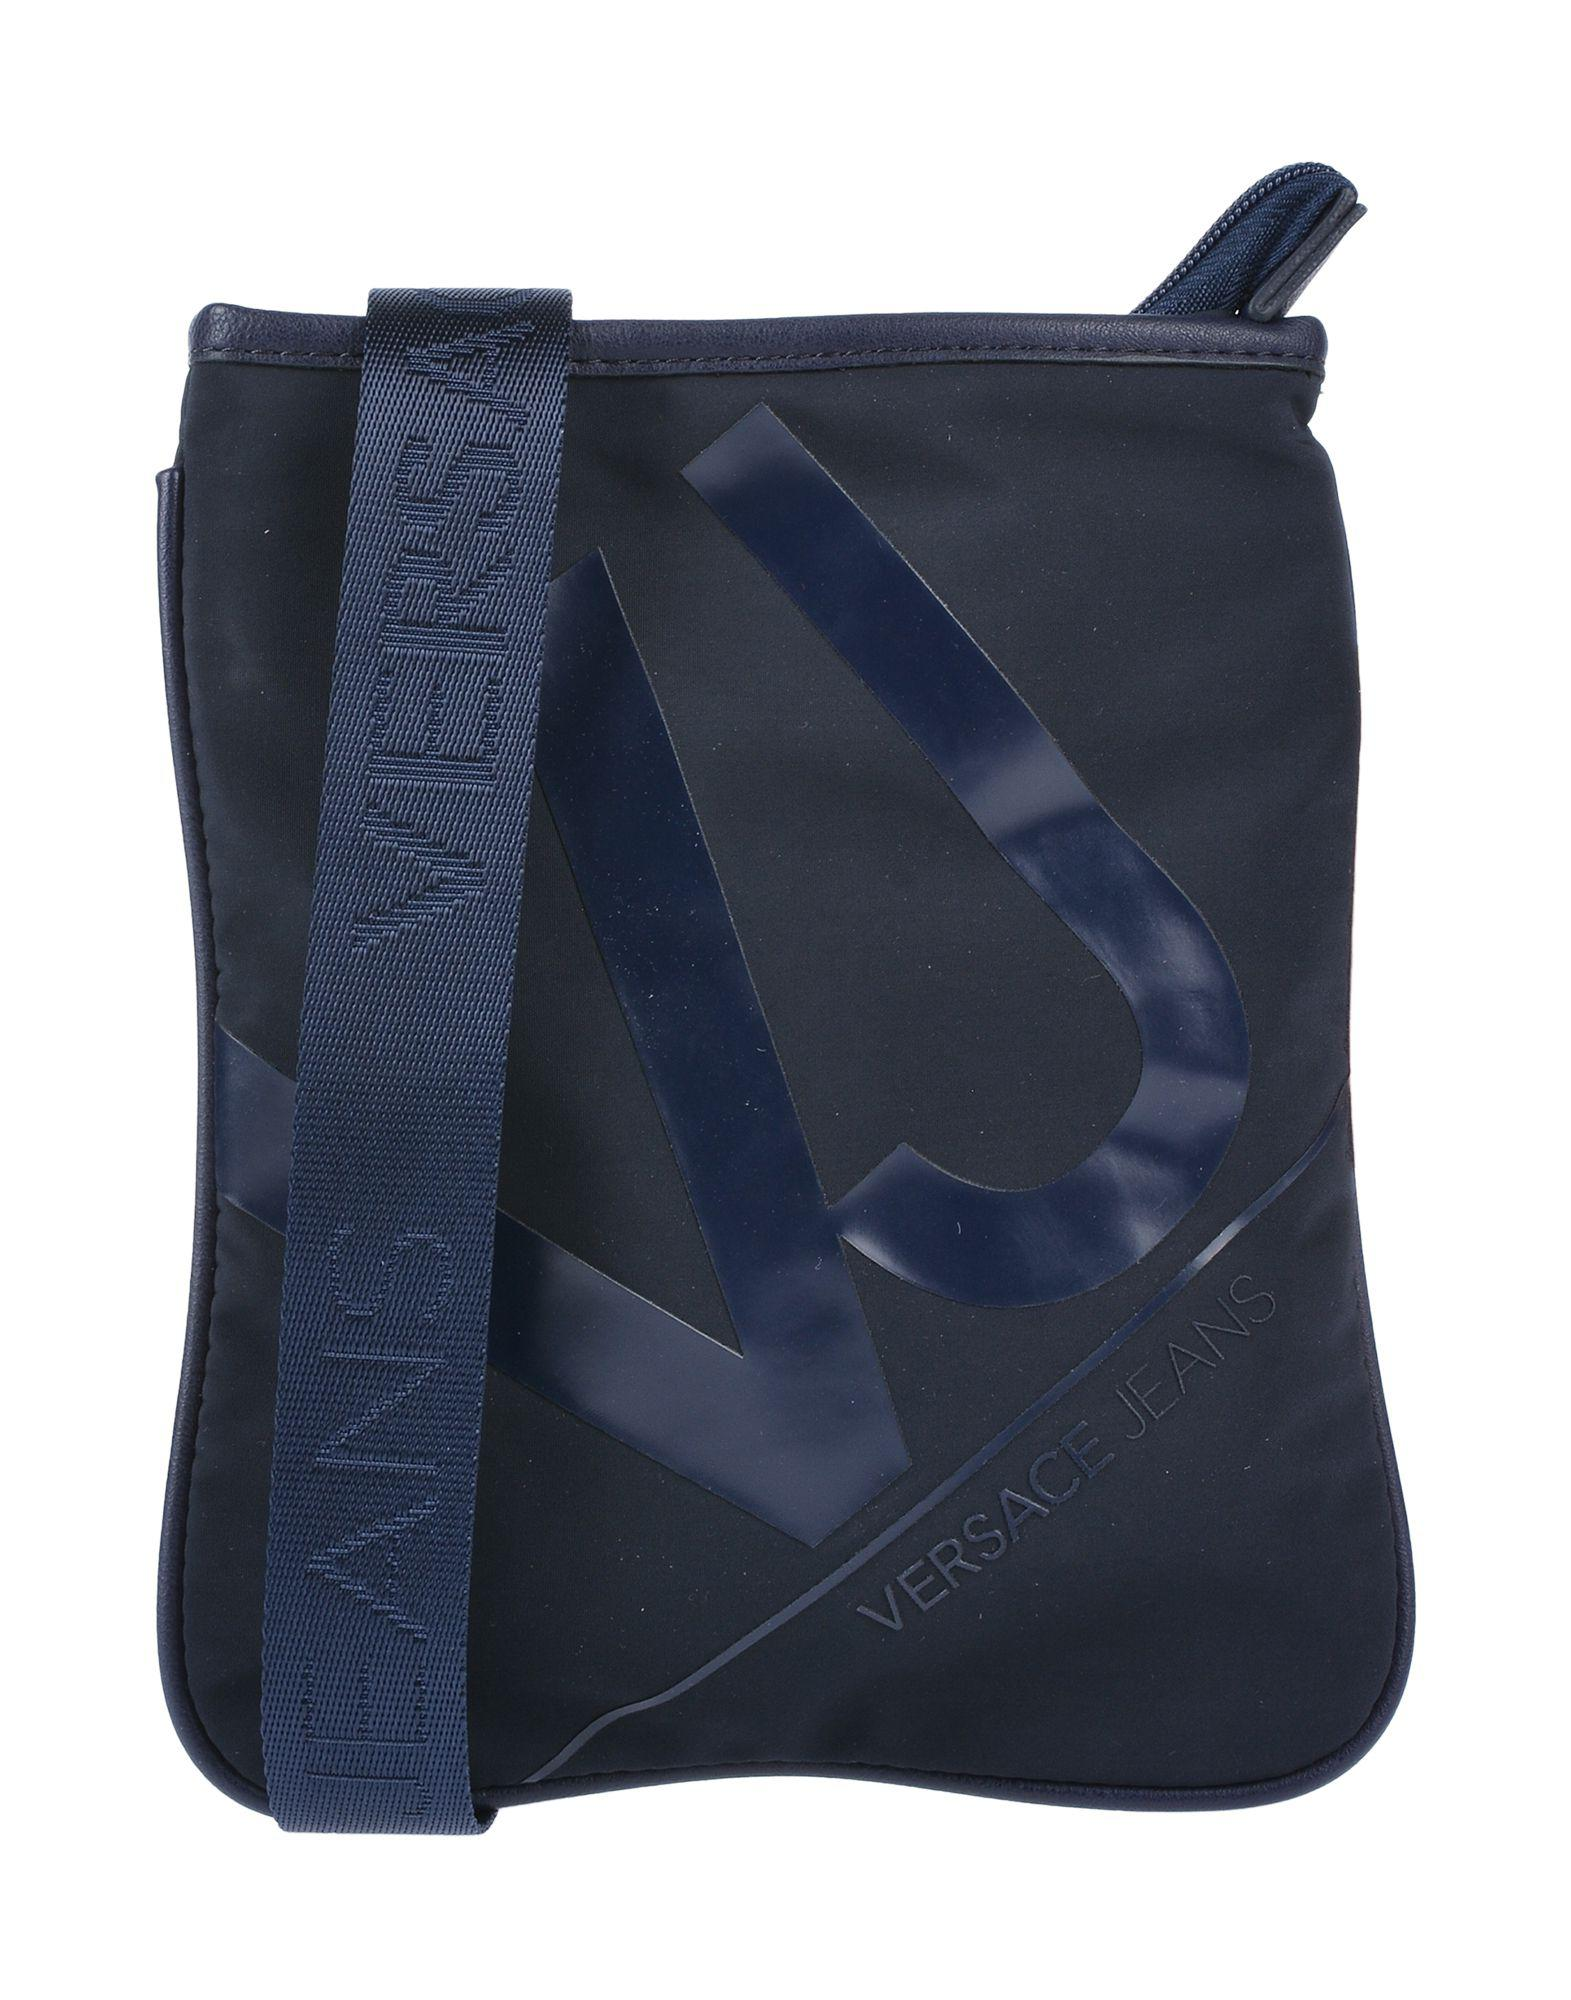 Versace Jeans - Blue Cross-body Bag for Men - Lyst. View fullscreen 2ede308c0f449